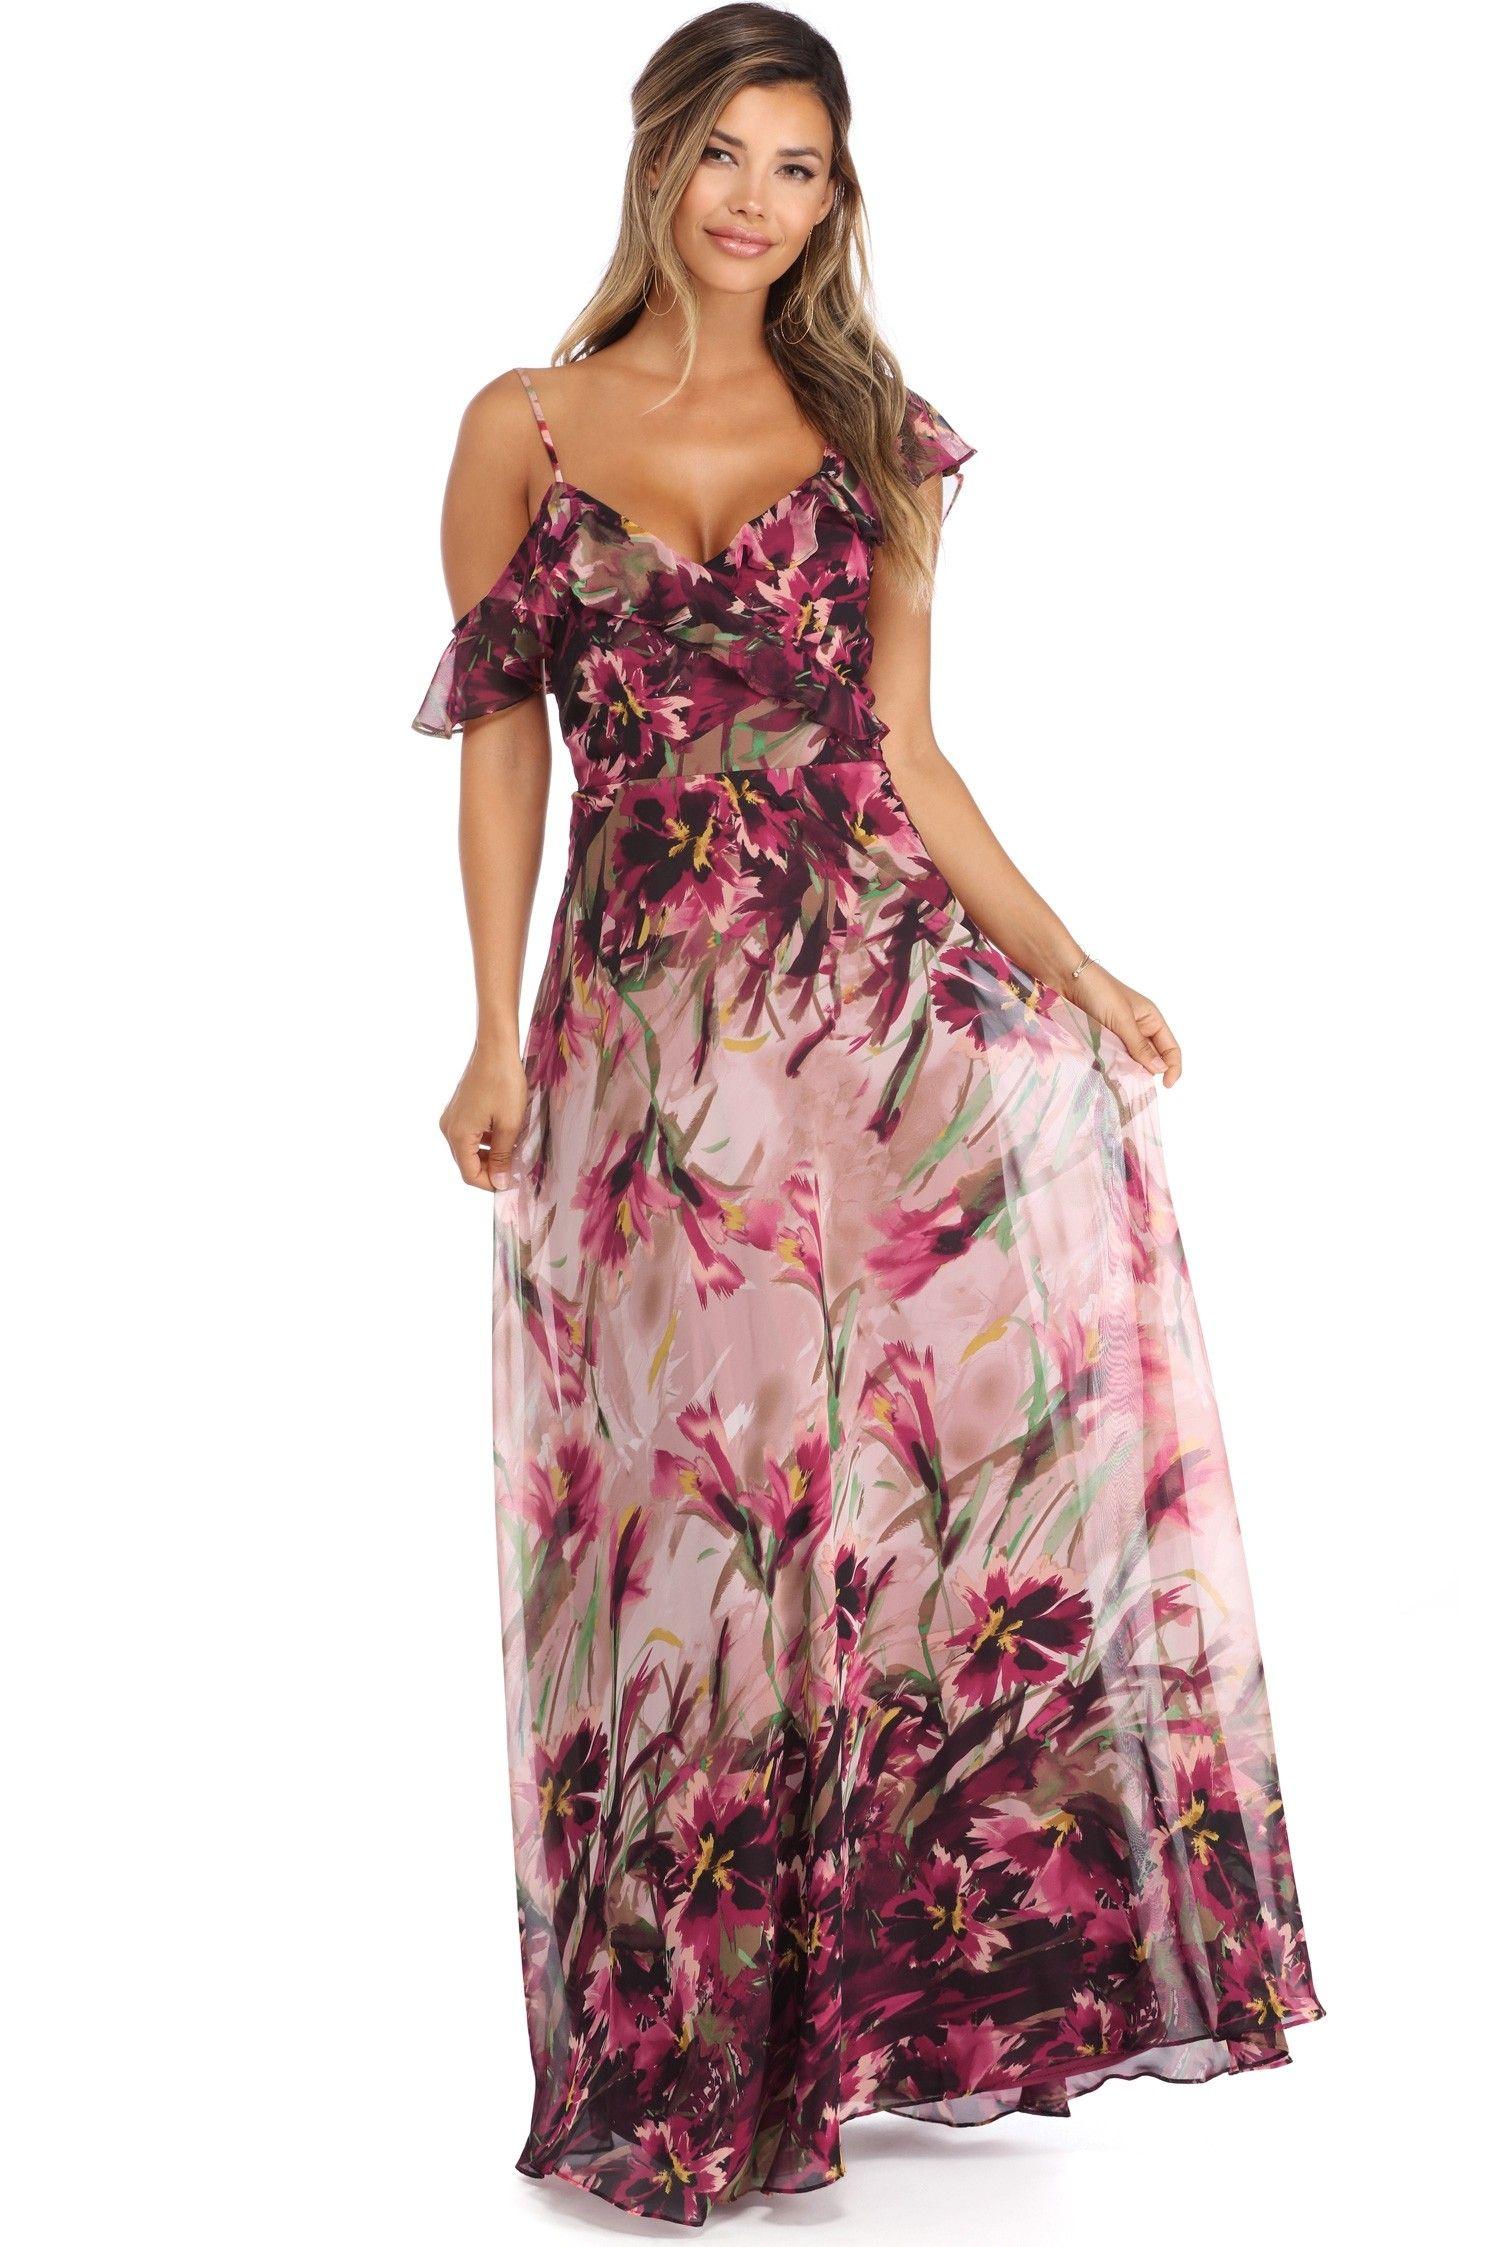 Abigail Burgundy Floral Chiffon Dress   formal dresses   Pinterest